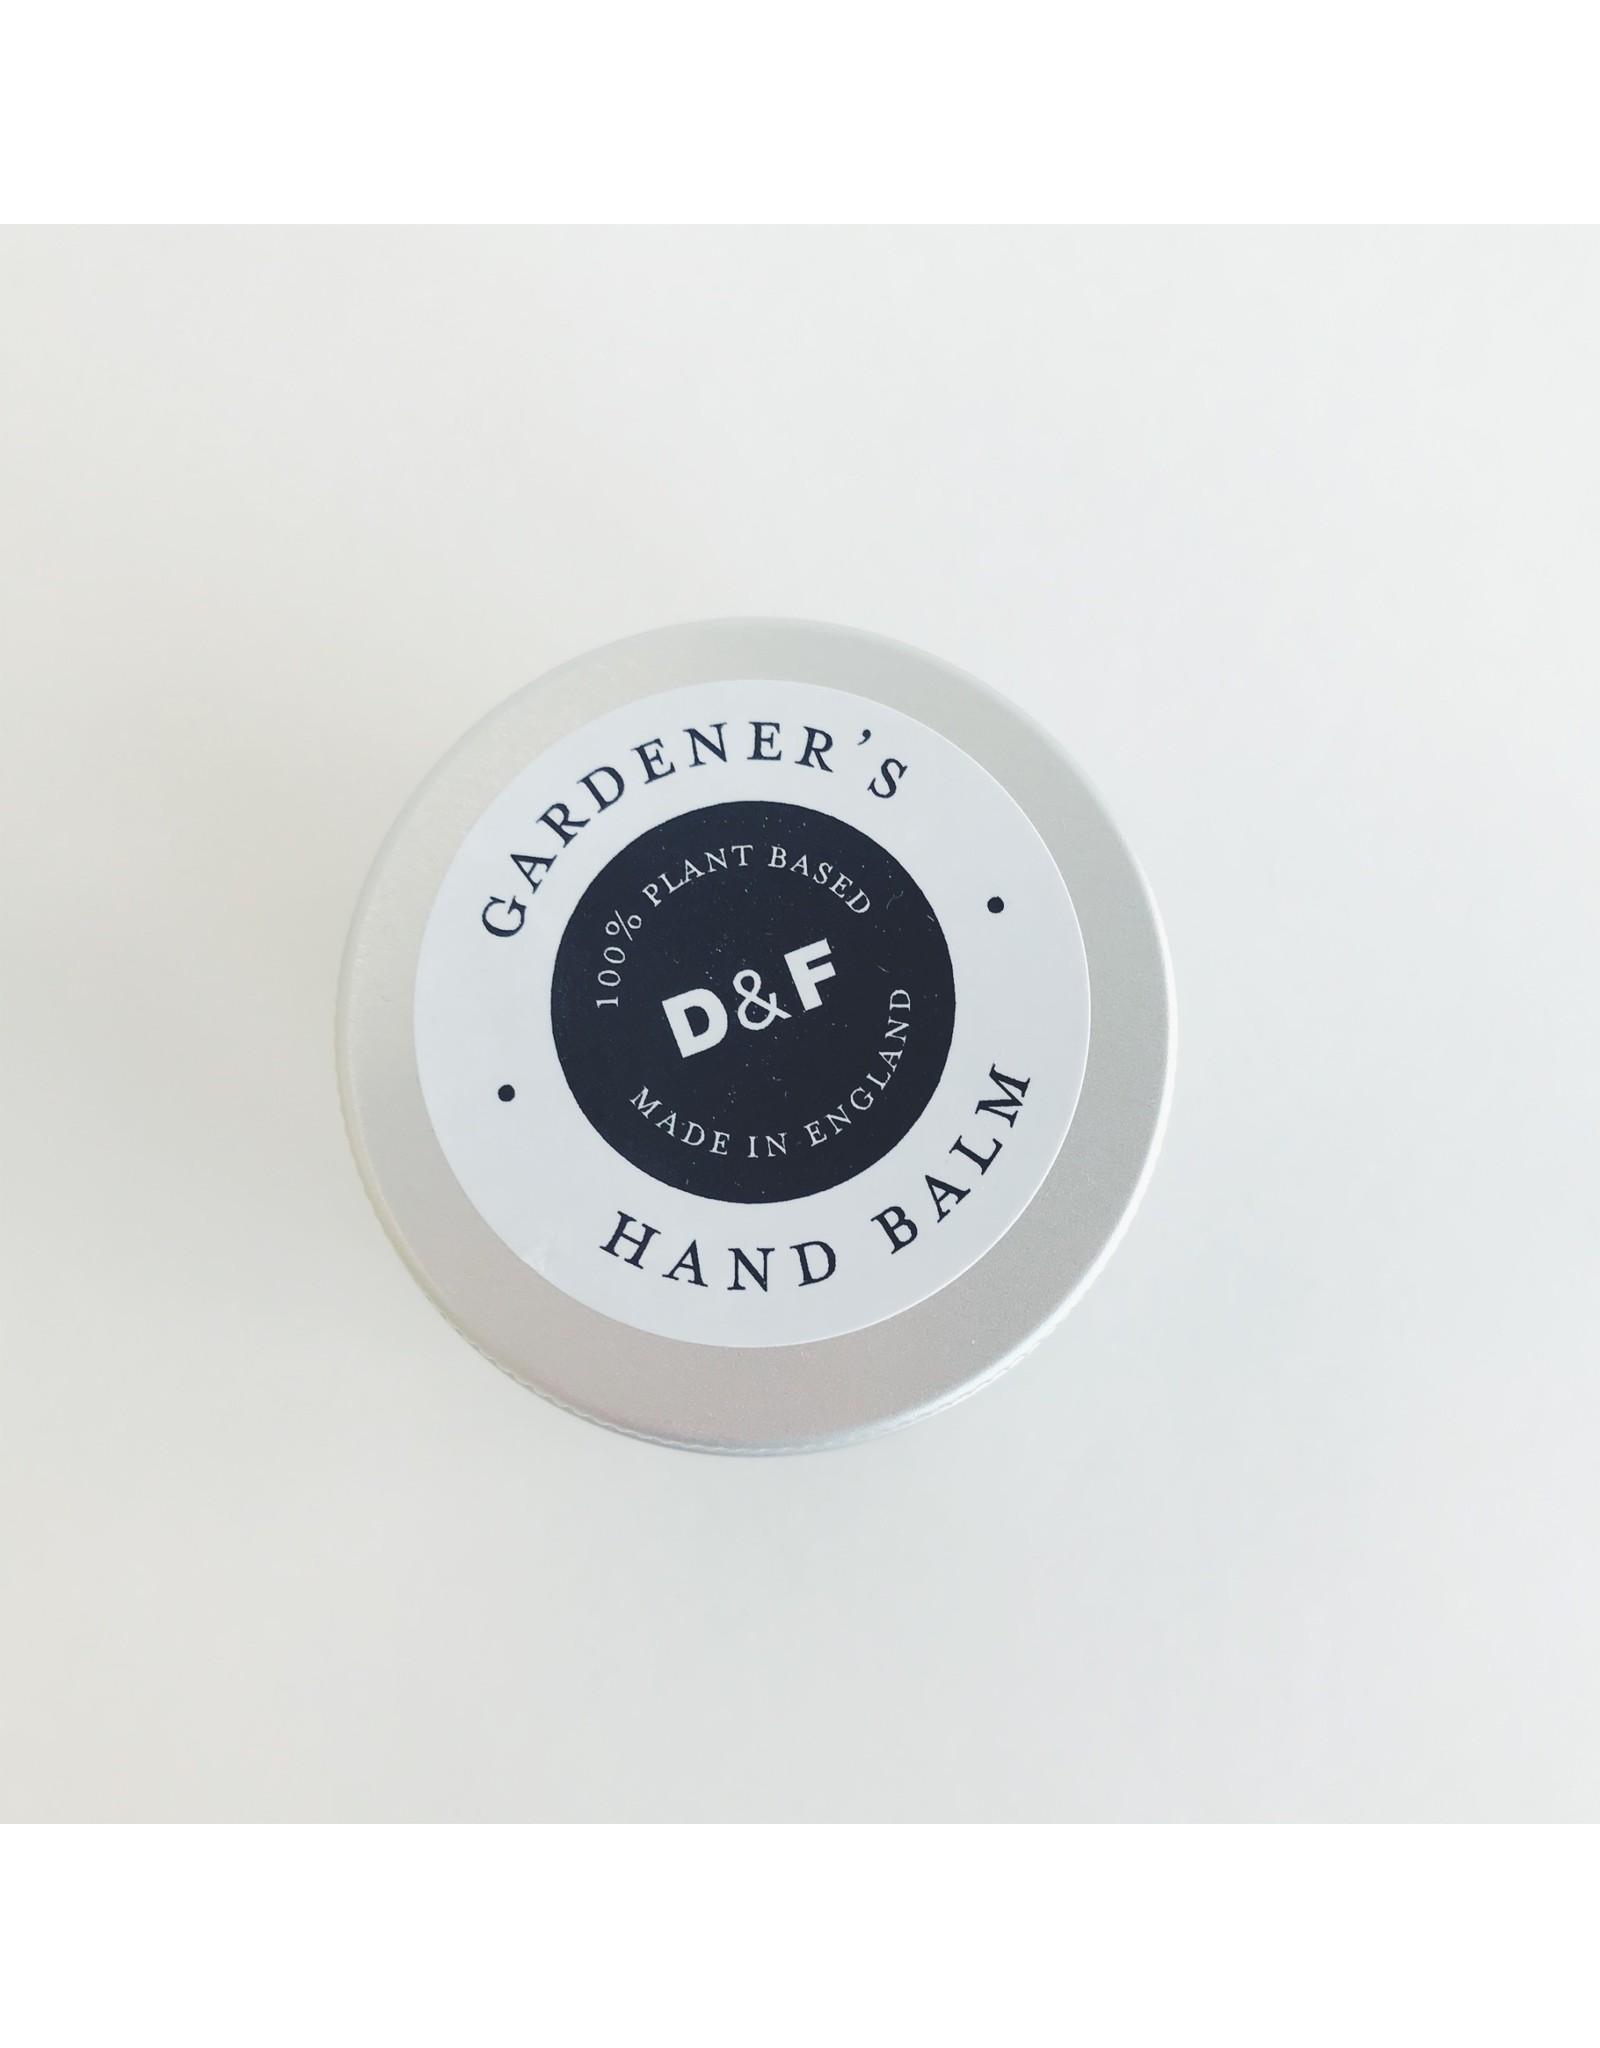 Gardener's Hand Balm